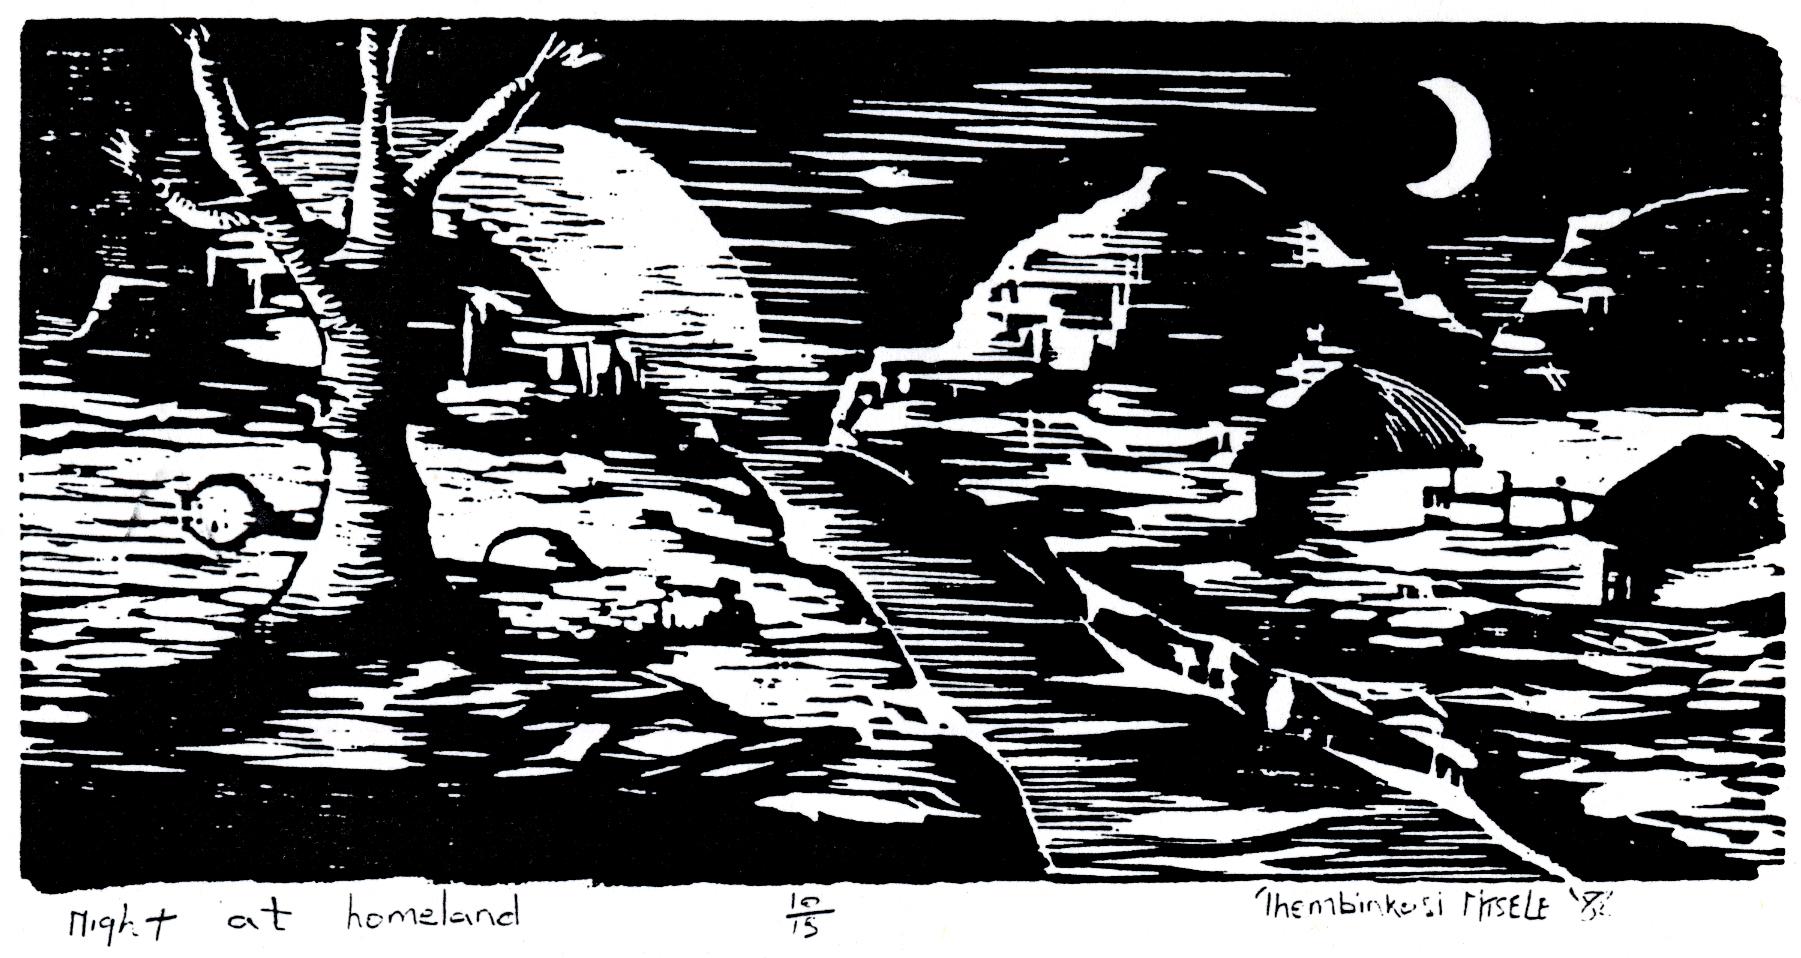 Thembinkosi Ntsele. Night at Homeland, 1988. Linocut